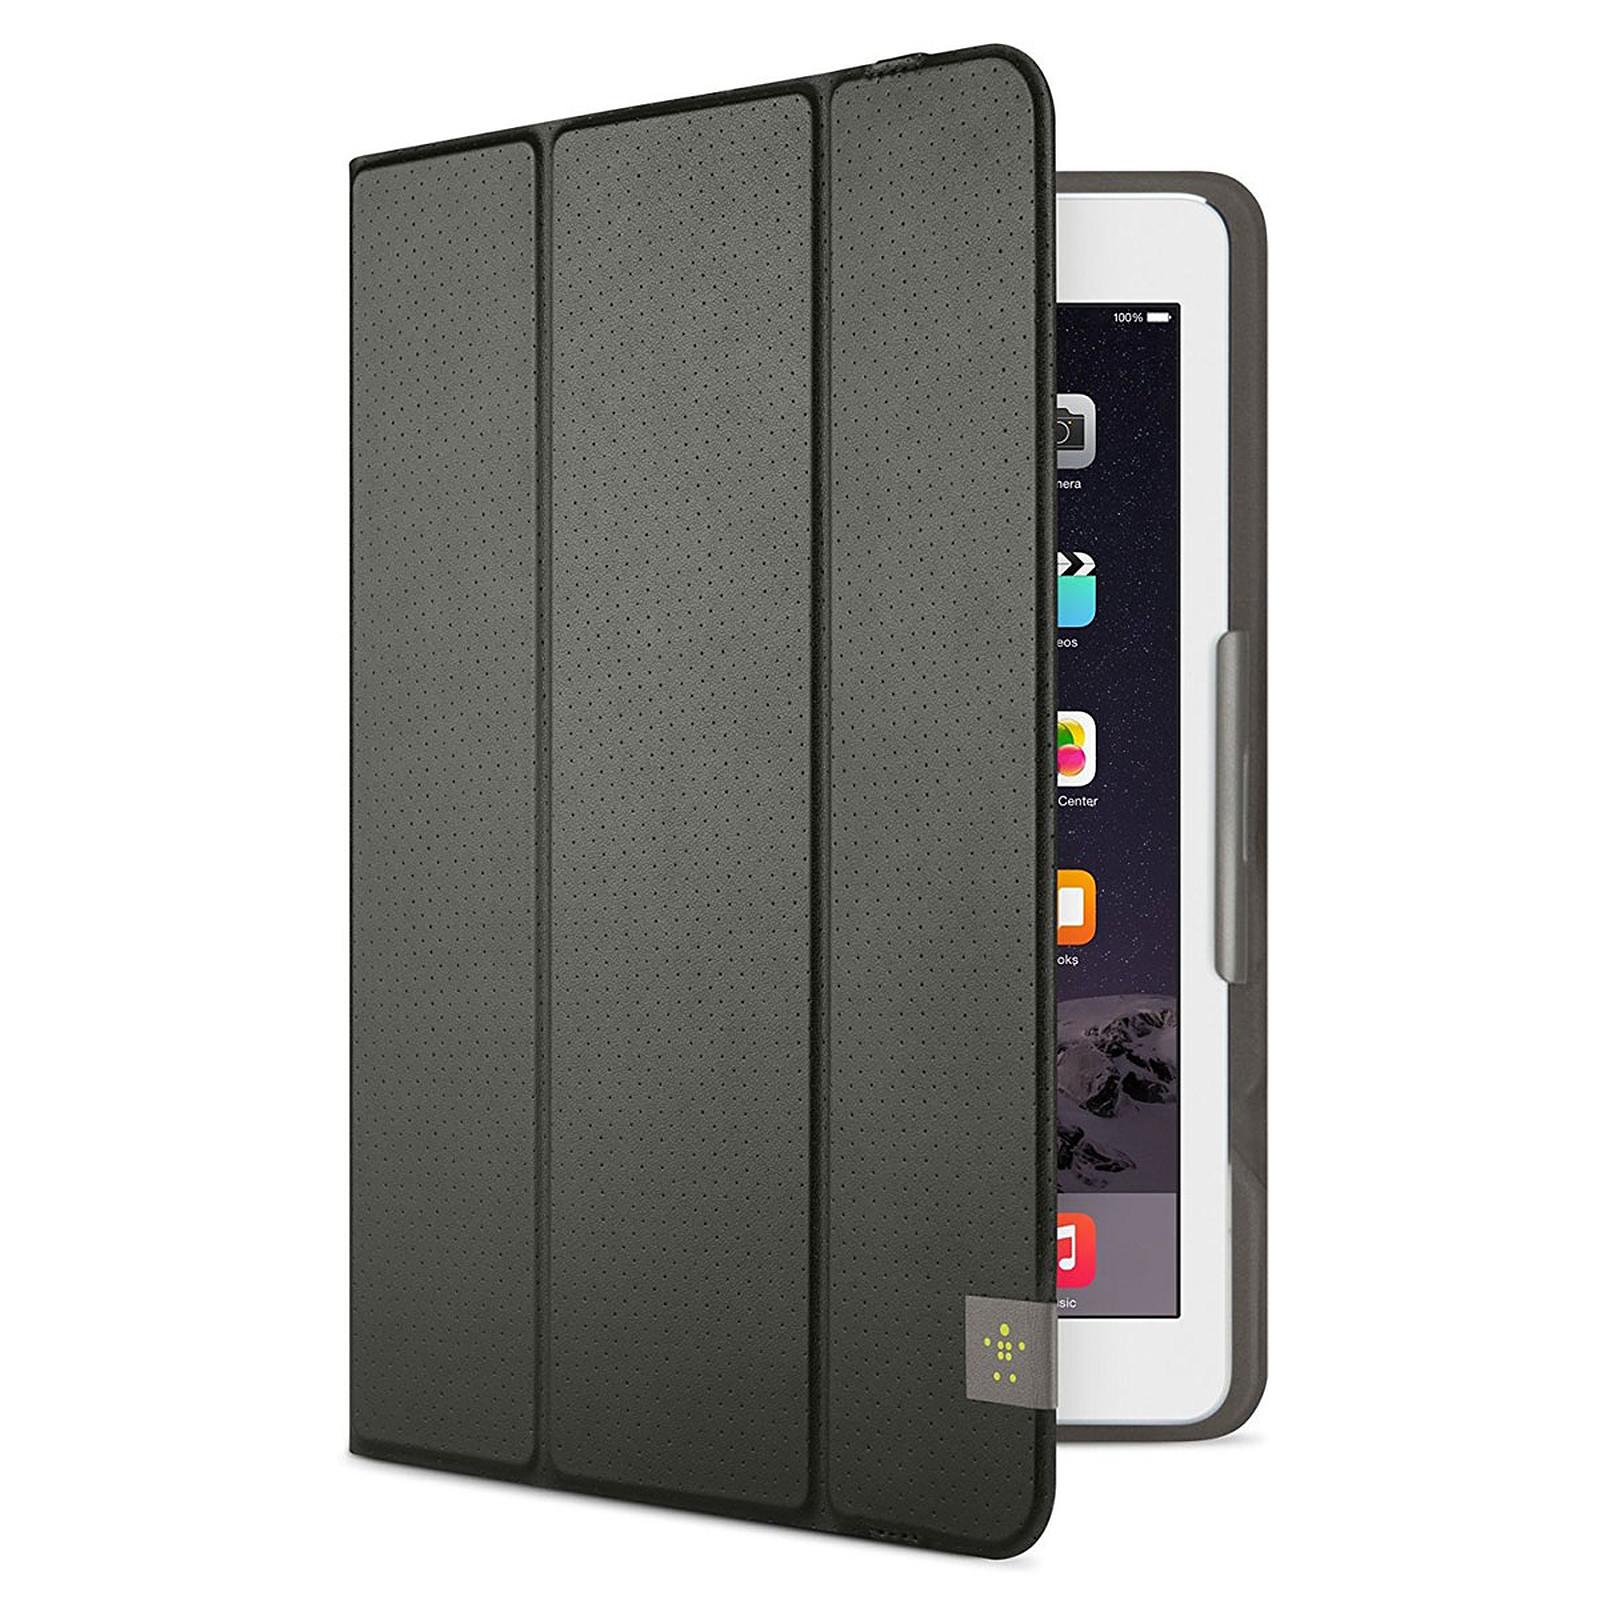 Belkin Trifold Folio iPadAir et iPadAir2